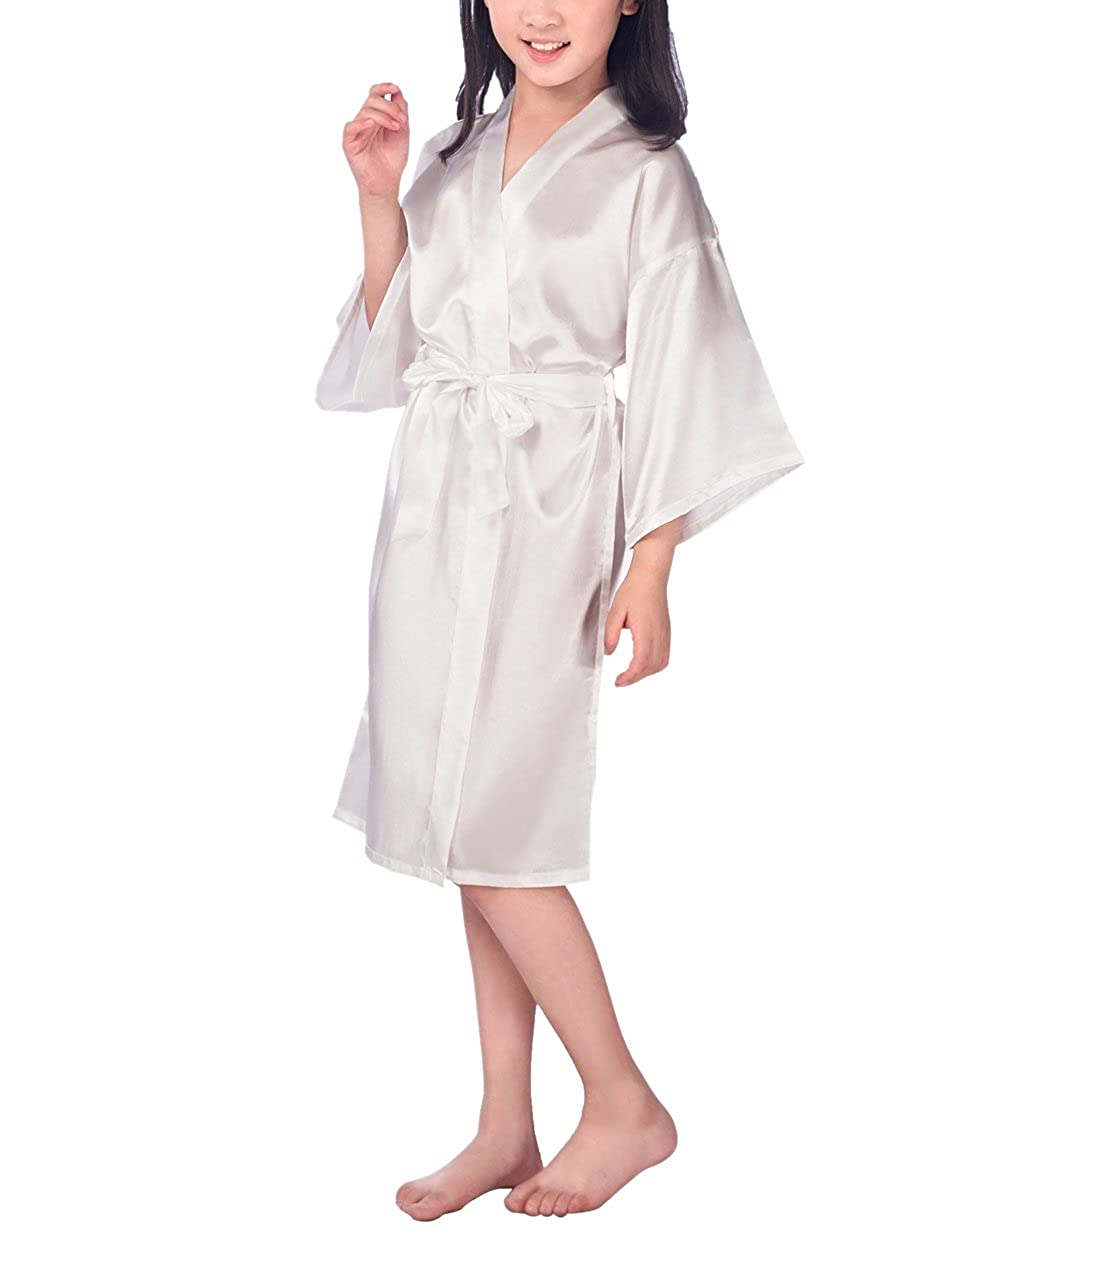 Ruth Wang Bambini In Raso Di Seta Accappatoio Kimono Vestaglia Pajamas Sleepwear Robe